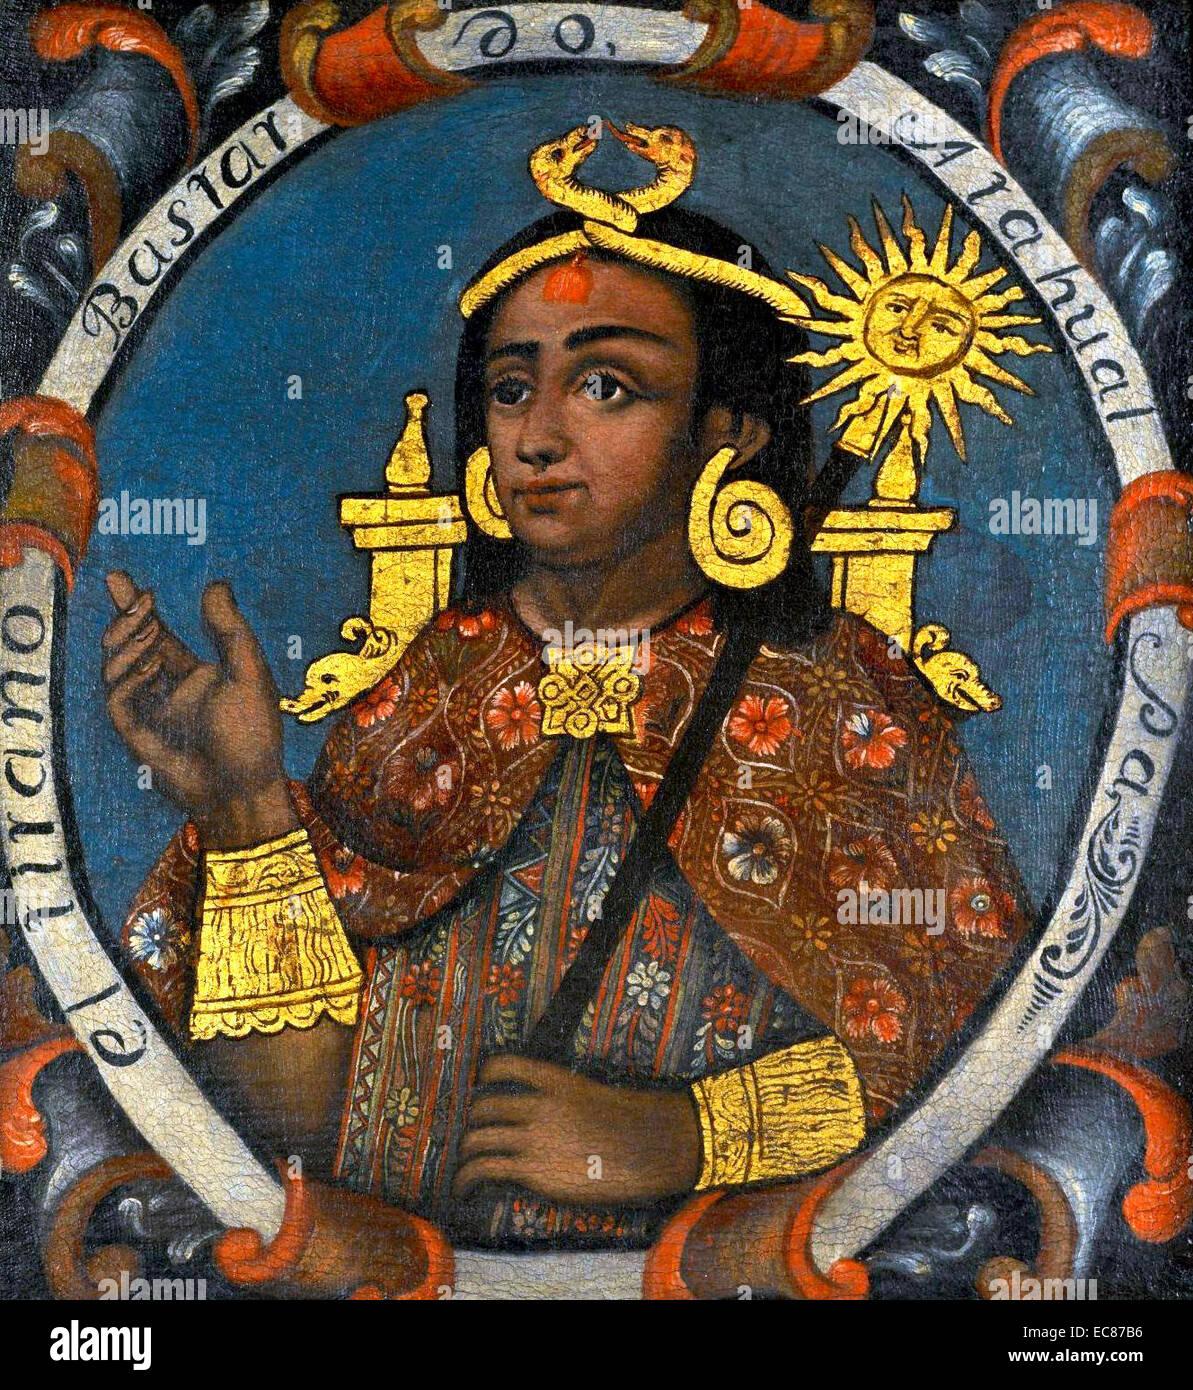 Portrait of Atahualpa (1500-1533) Last Sapa Inca emperor before the Spanish conquest. Dated 16th Century - Stock Image